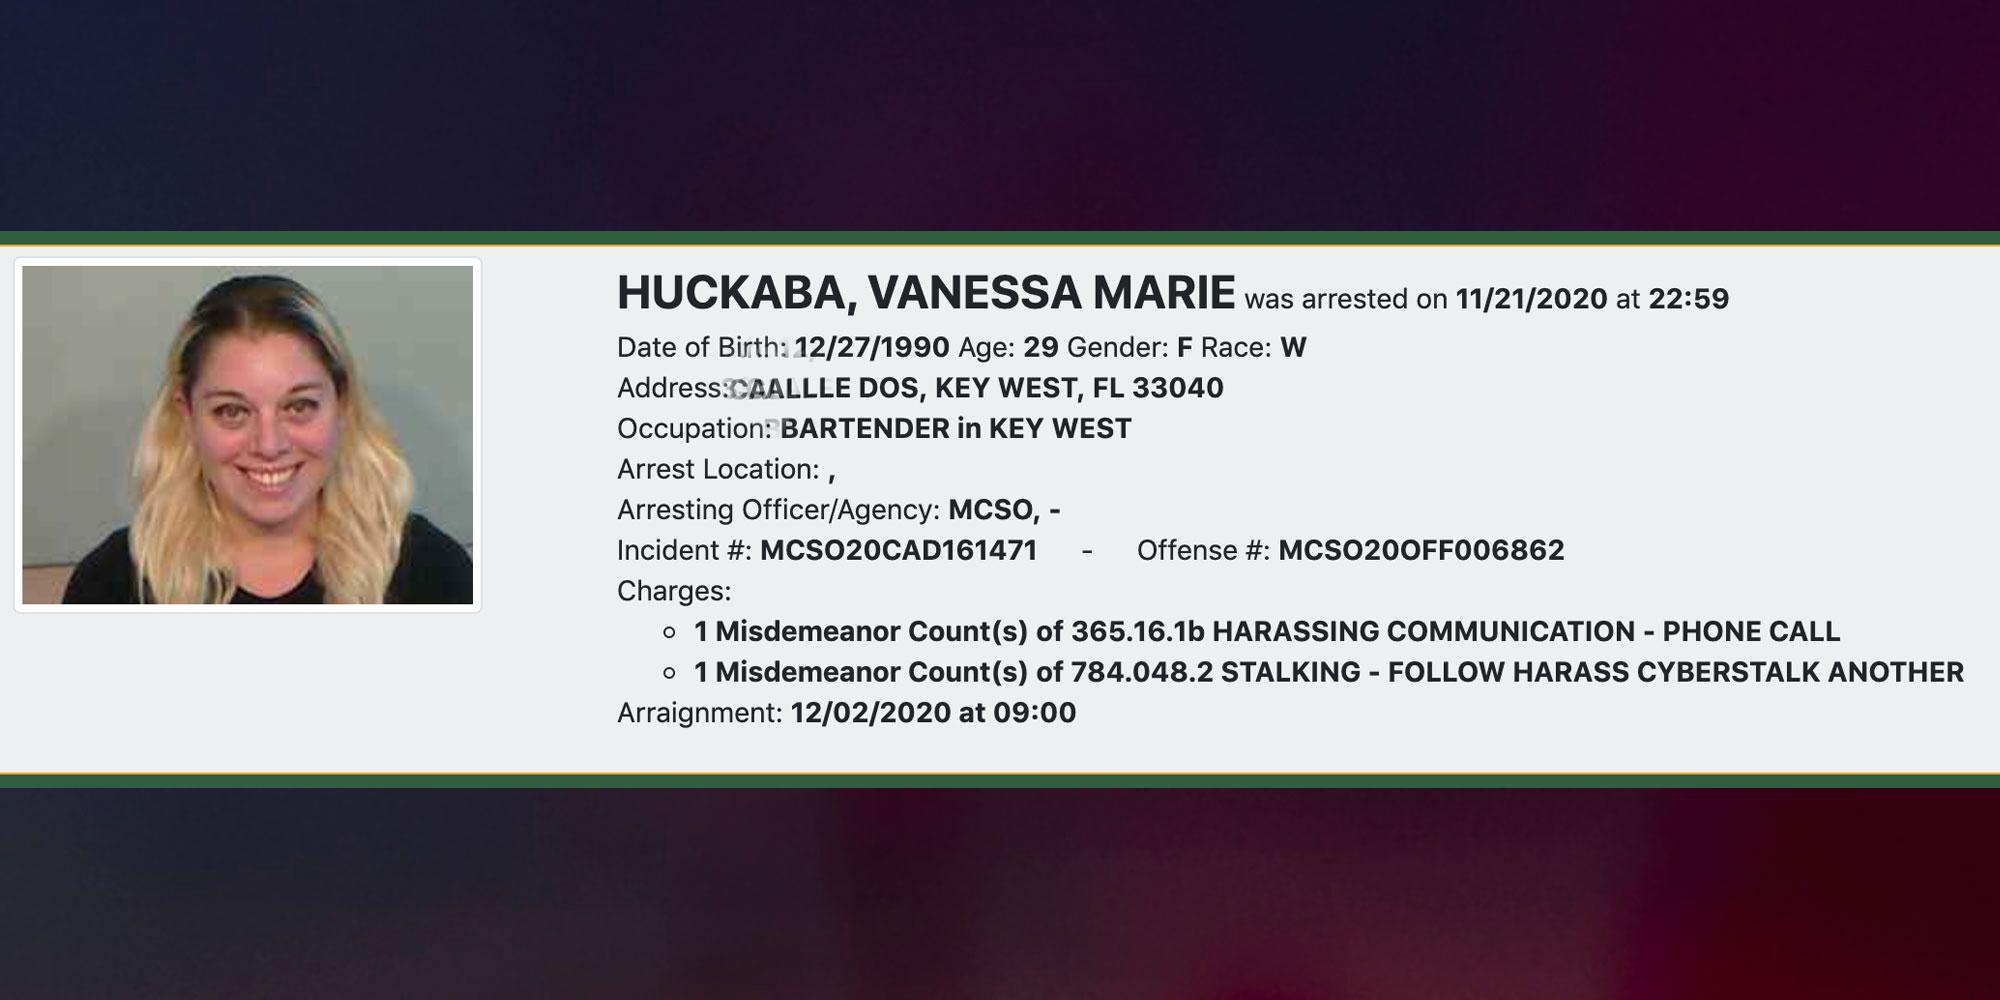 Vanessa-Huckaba-monroe-county-booking-tcd